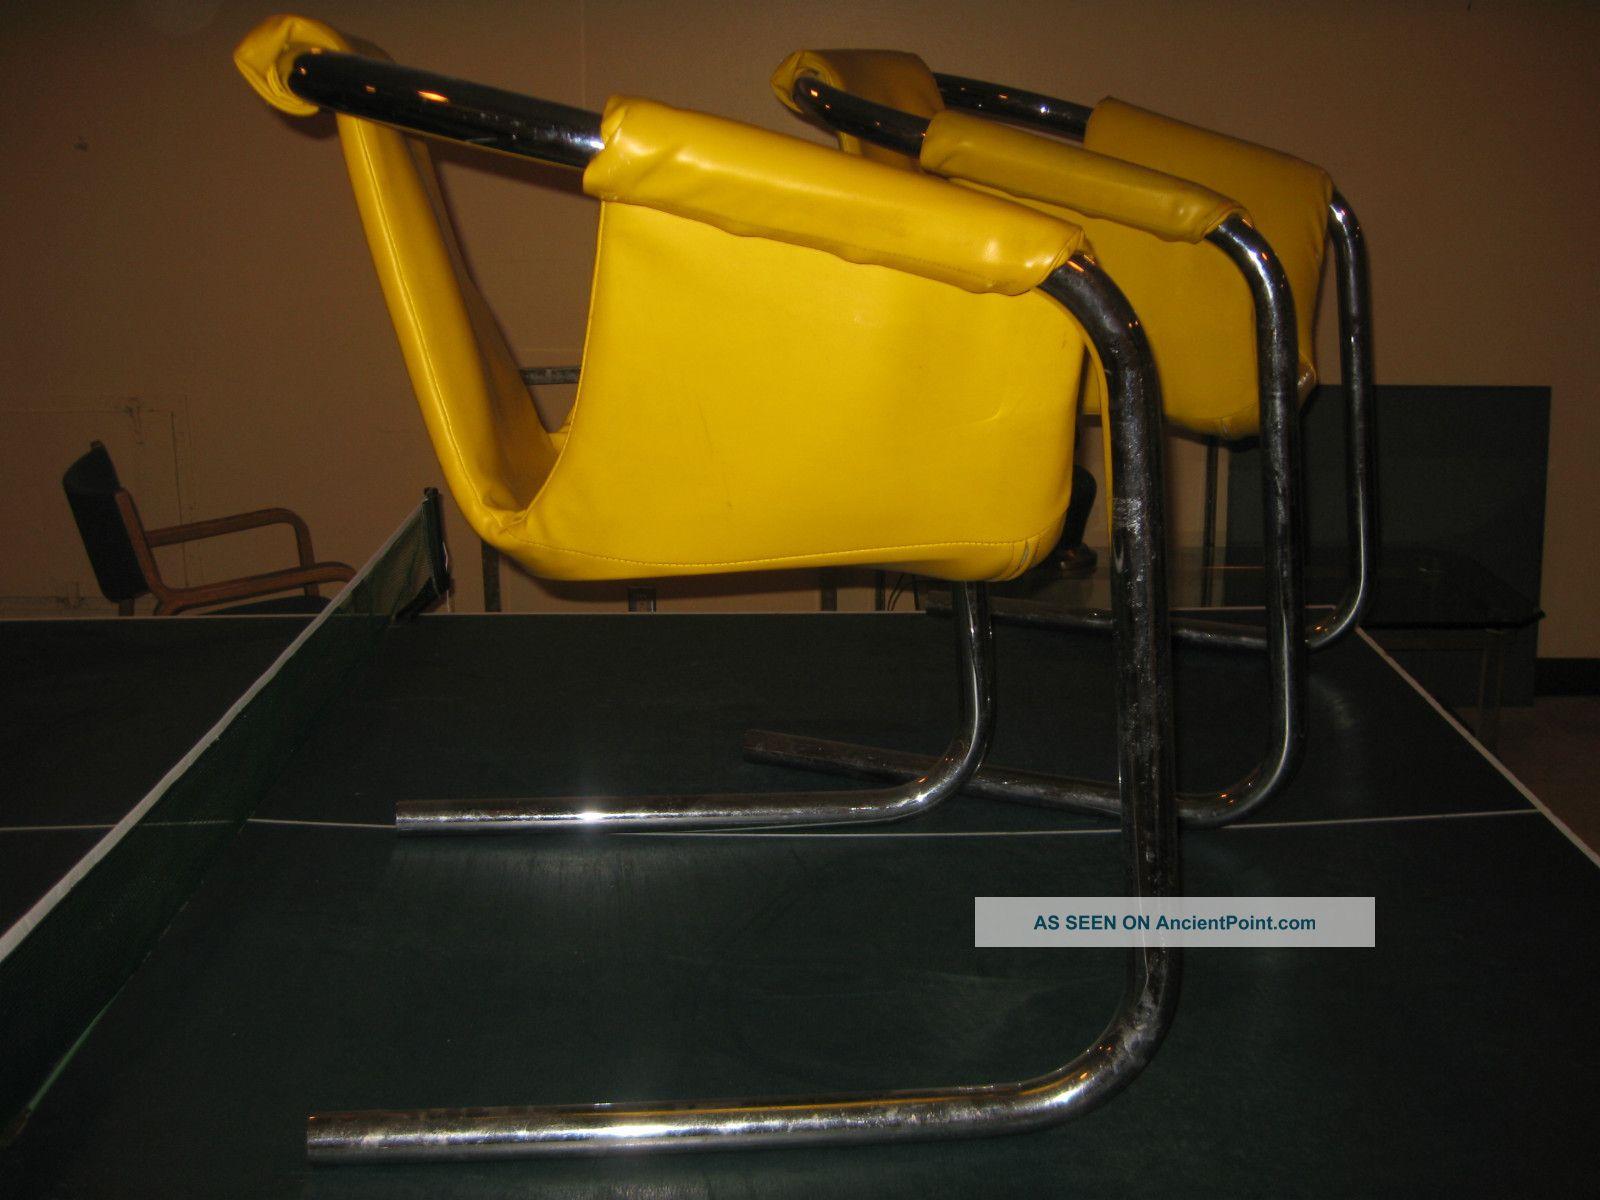 Mid Century Modern Milo Baugman Era Chrome Tube Sling Chairs 1970s Post-1950 photo